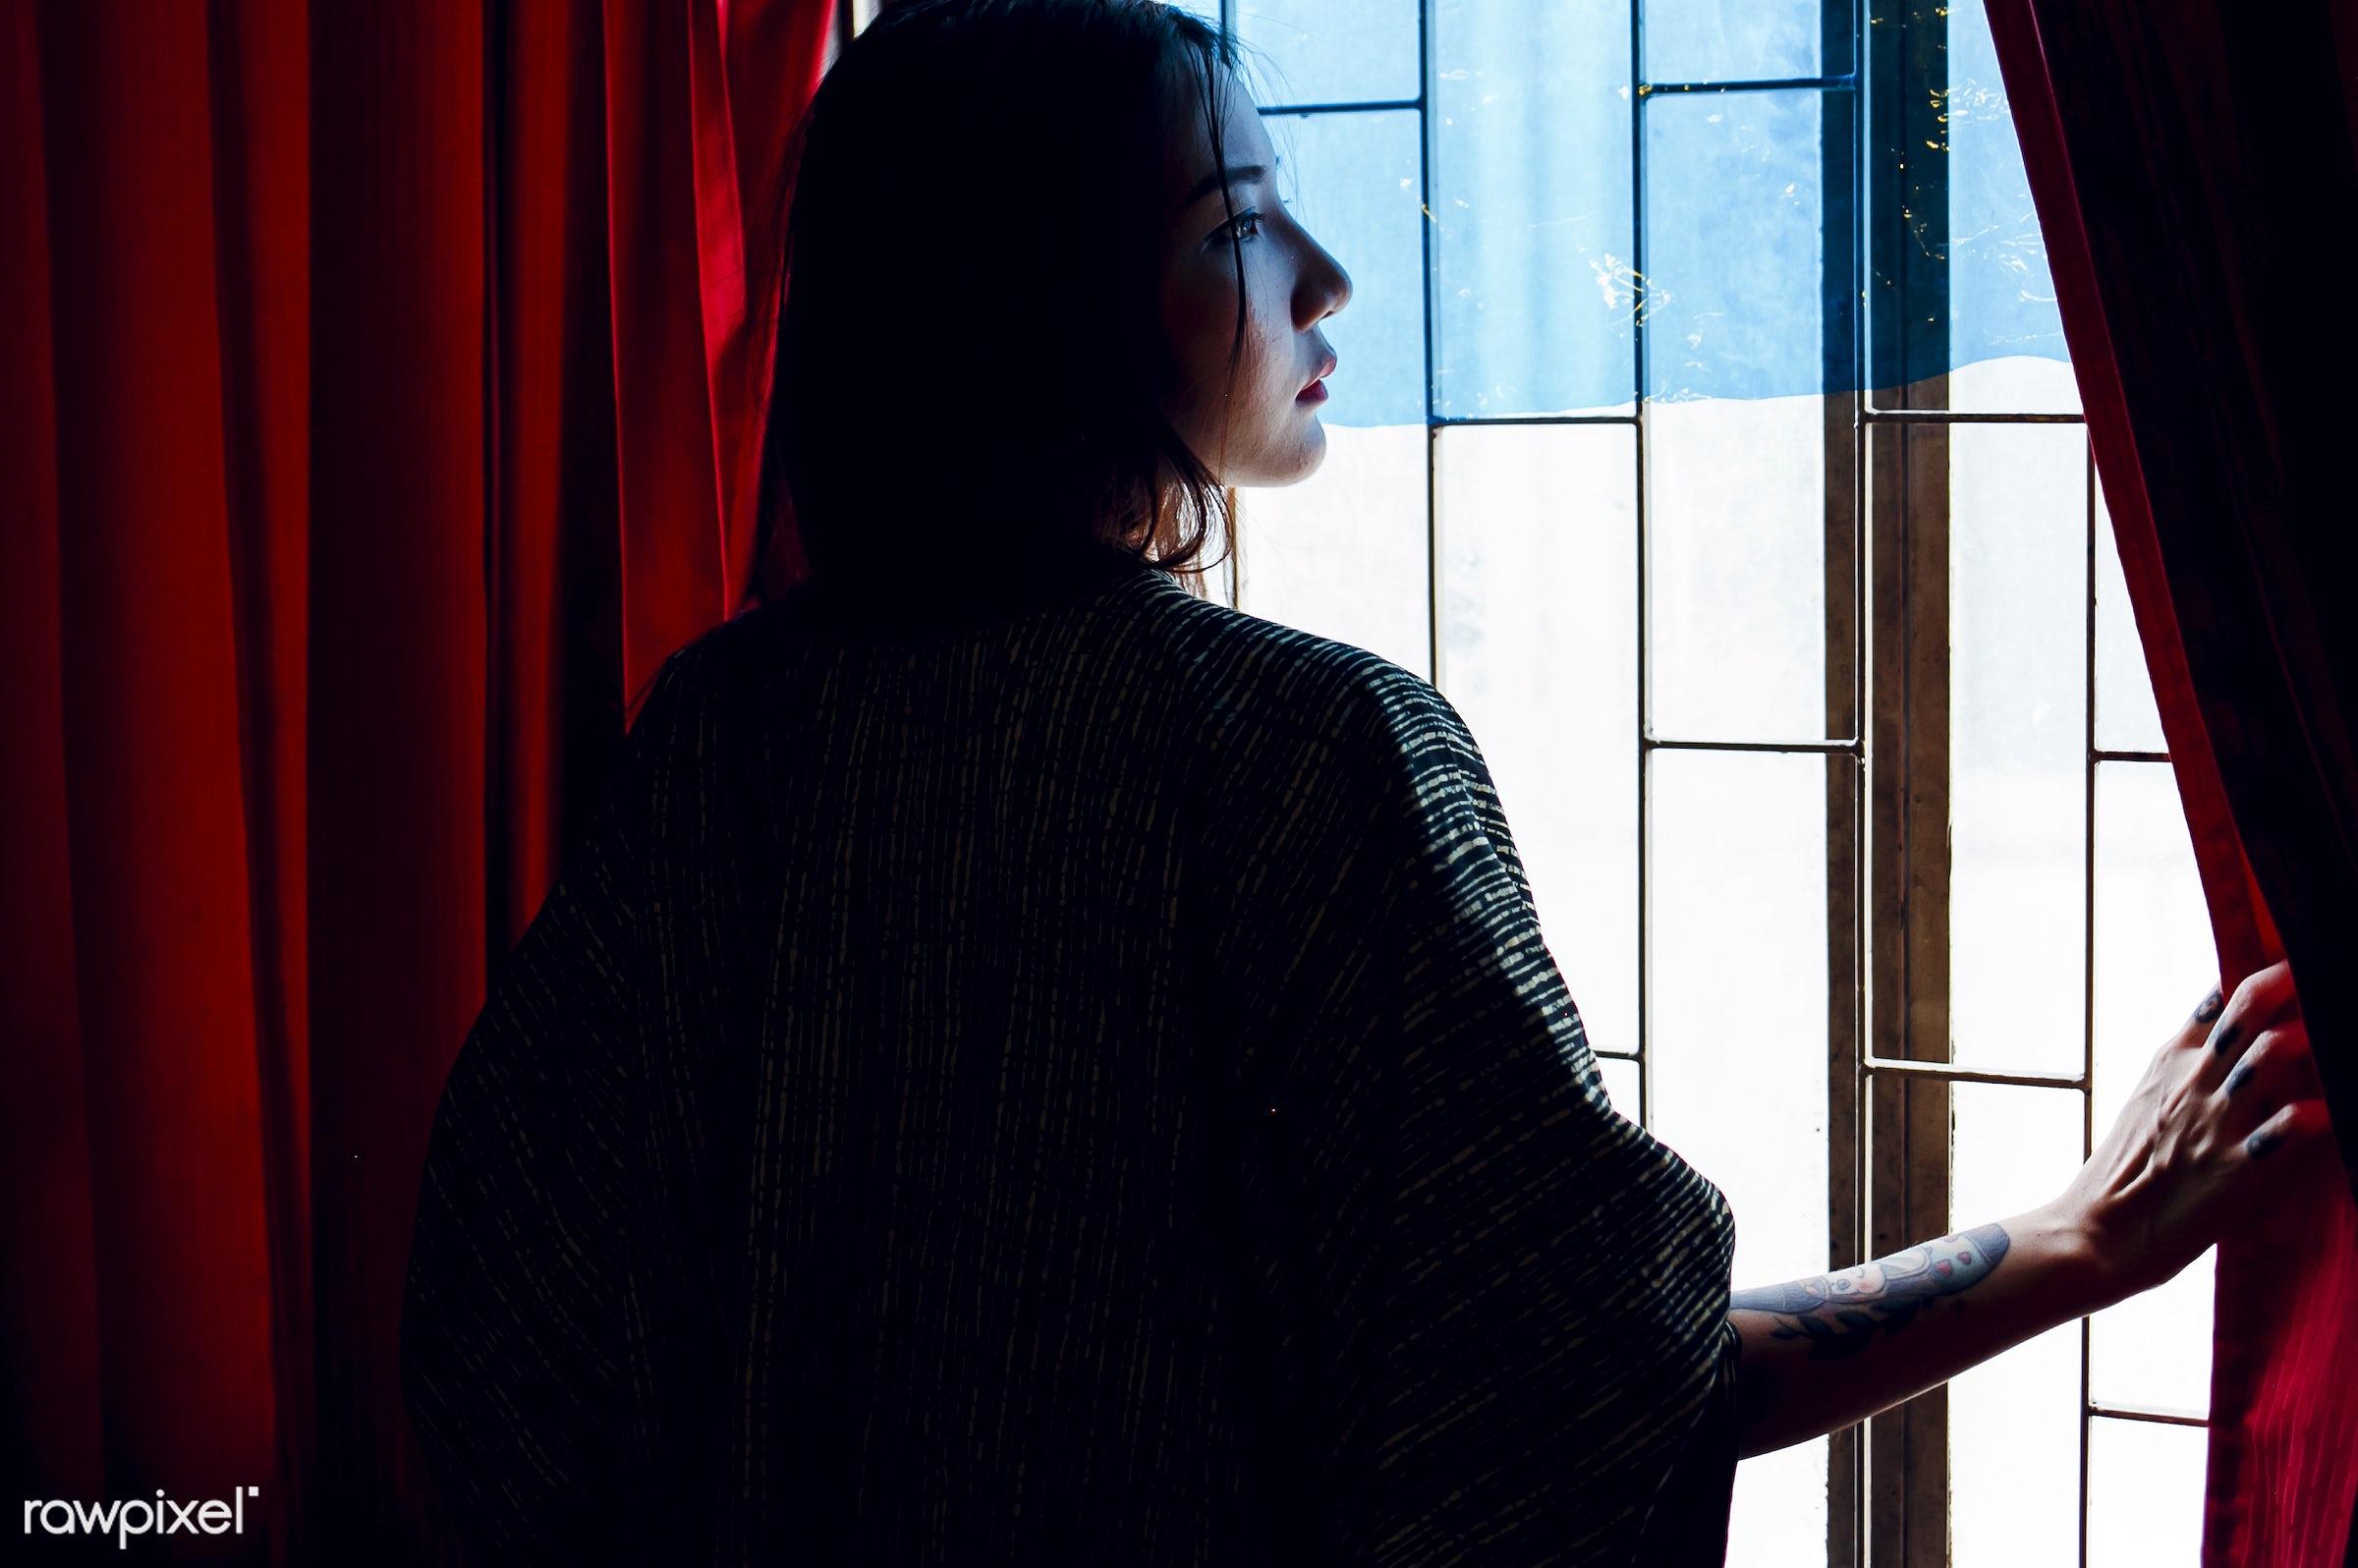 rear view, asian, curtain, open, window, woman, shadow, thoughtful, tattoo, shade, alone